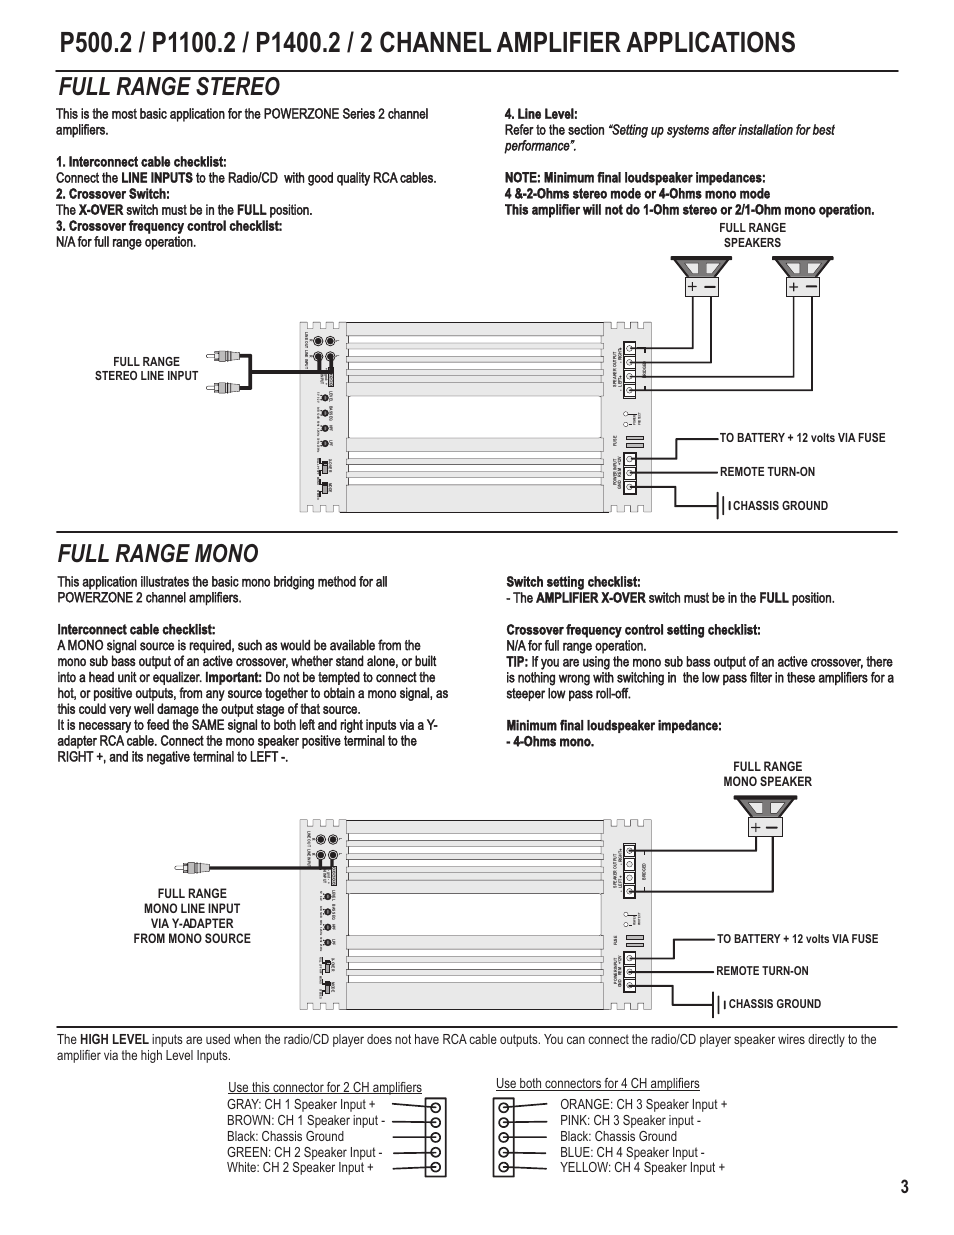 crunch amp wiring diagram wiring diagram save Bass Amp Wiring Diagram